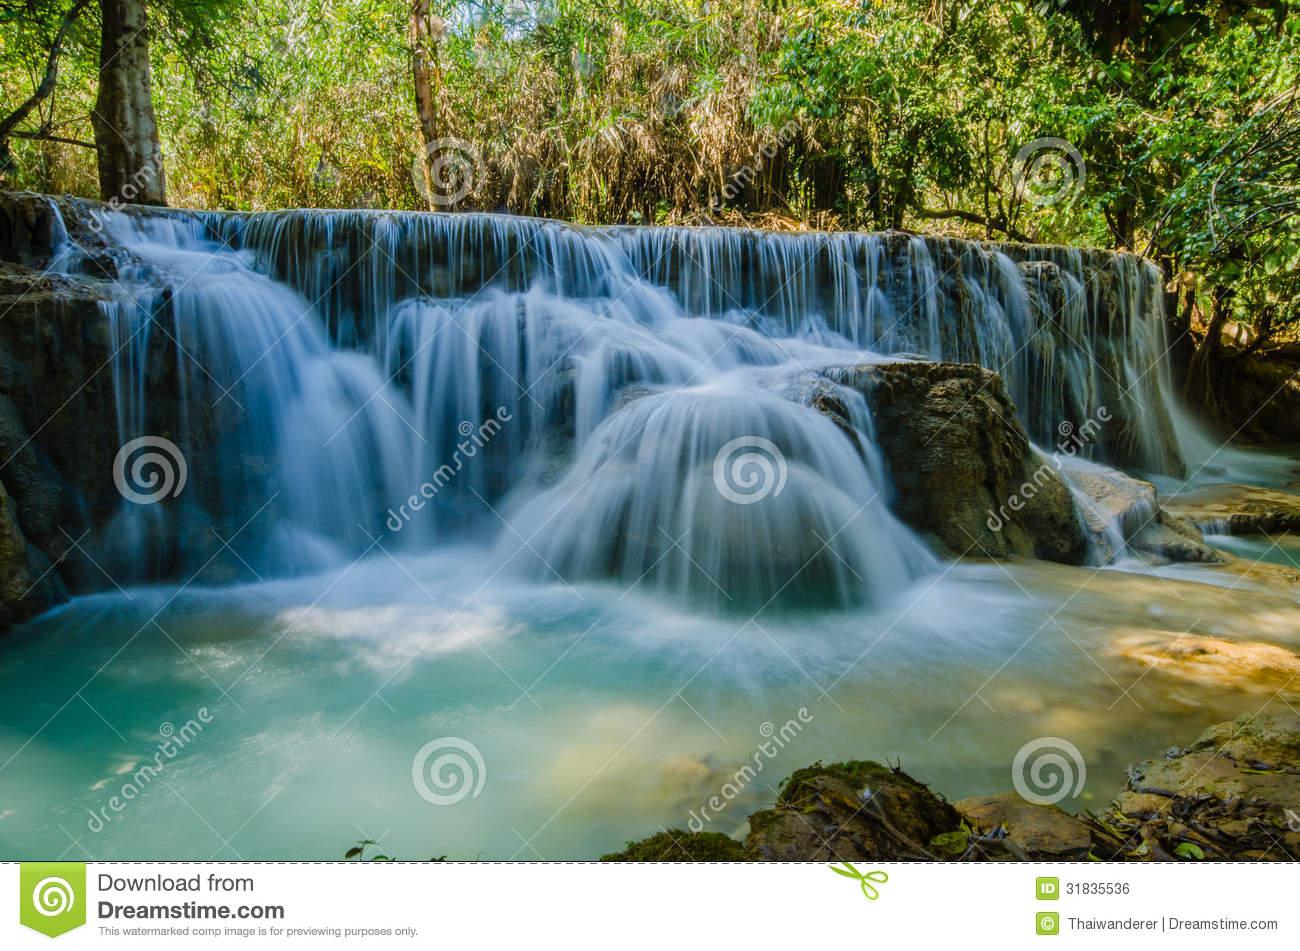 Kuang Si Waterfall clipart #10, Download drawings